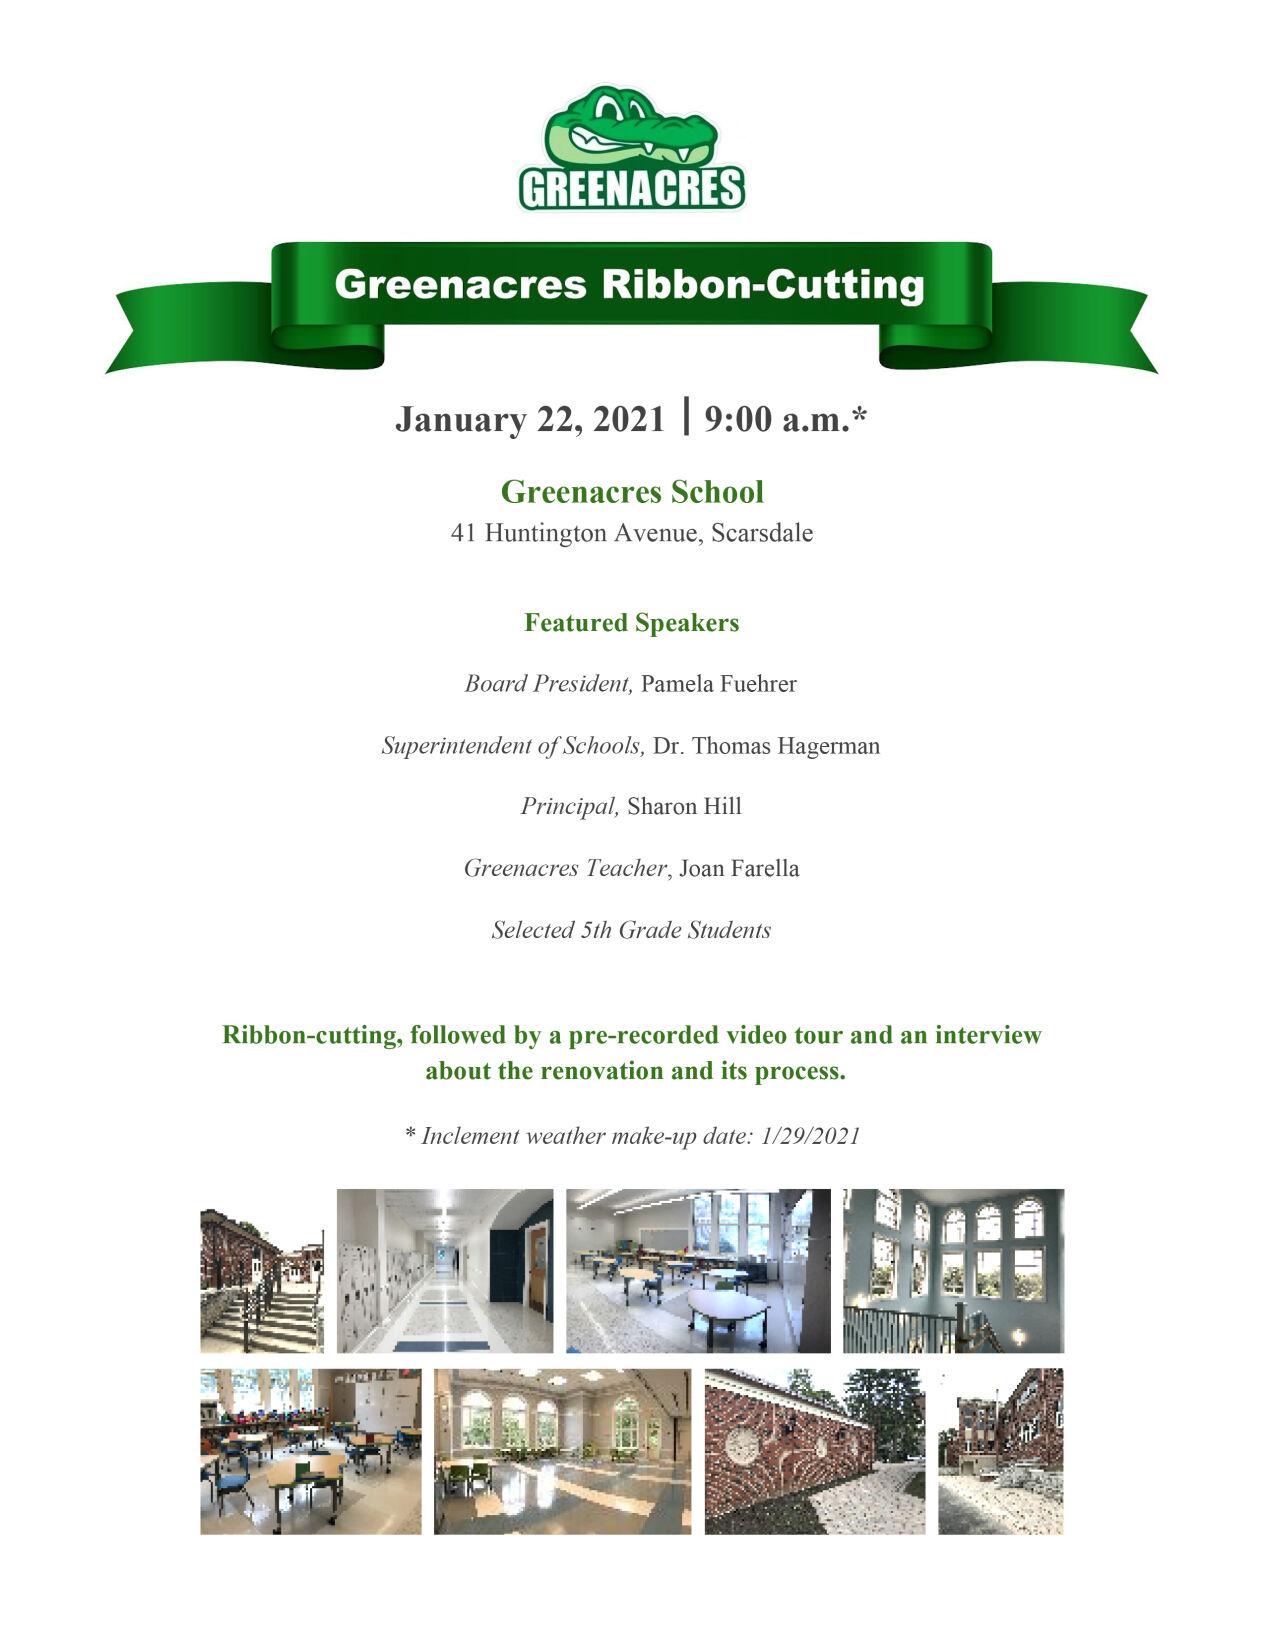 Greenacres ribbon-cutting program